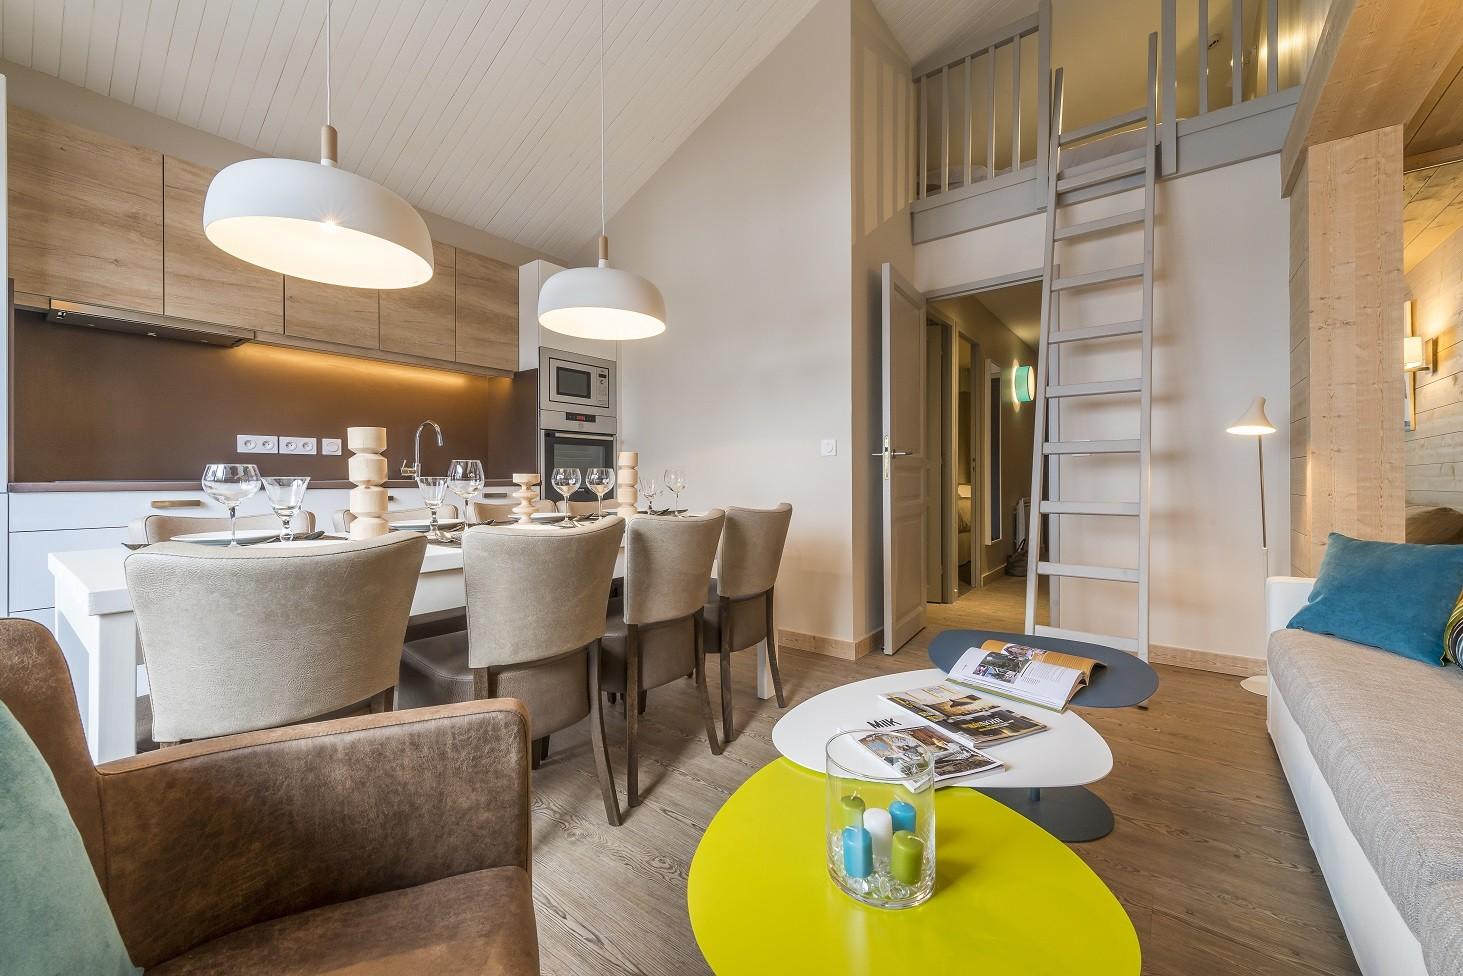 salon-avec-mezzanine-4-pieces-cabine-8-pers-140-1463x976-7732